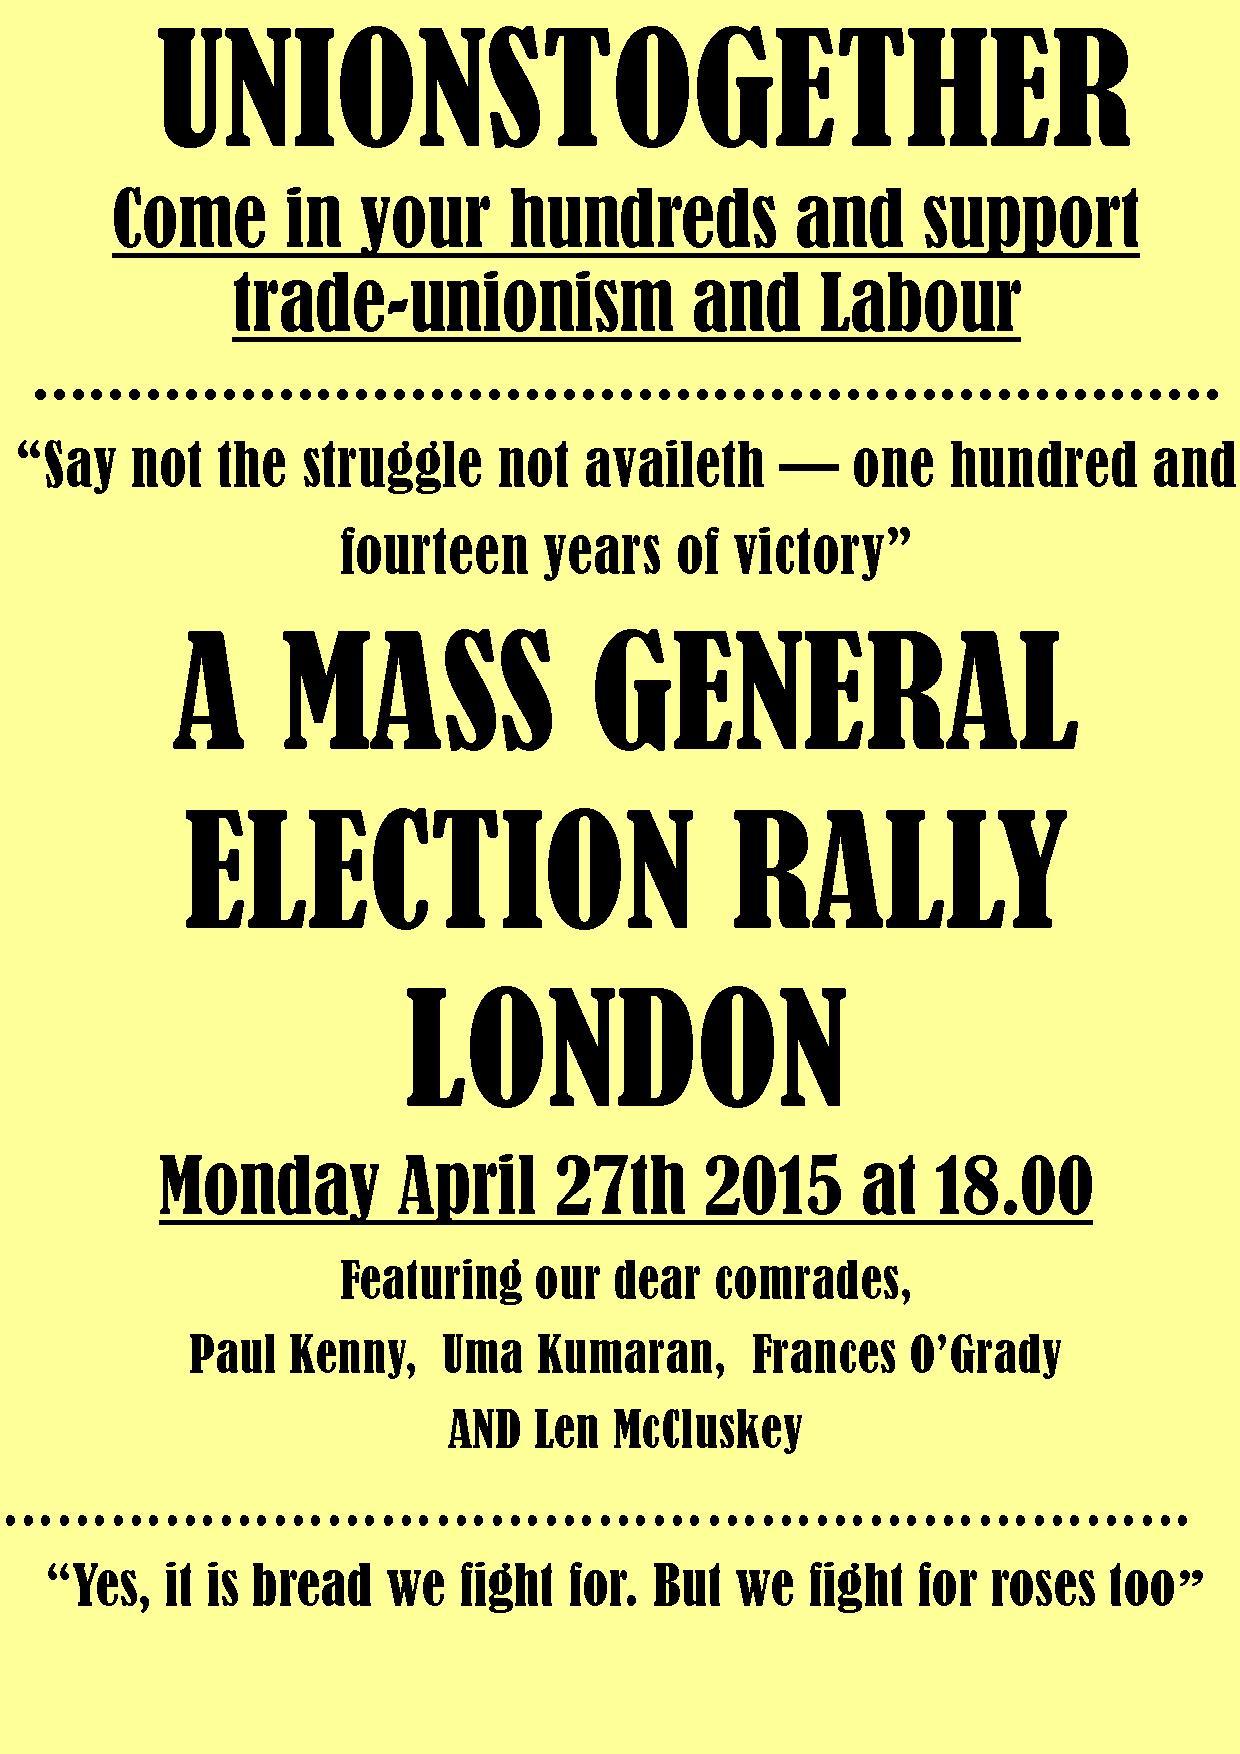 Poster_Retro_-_London_UPDATED.jpg